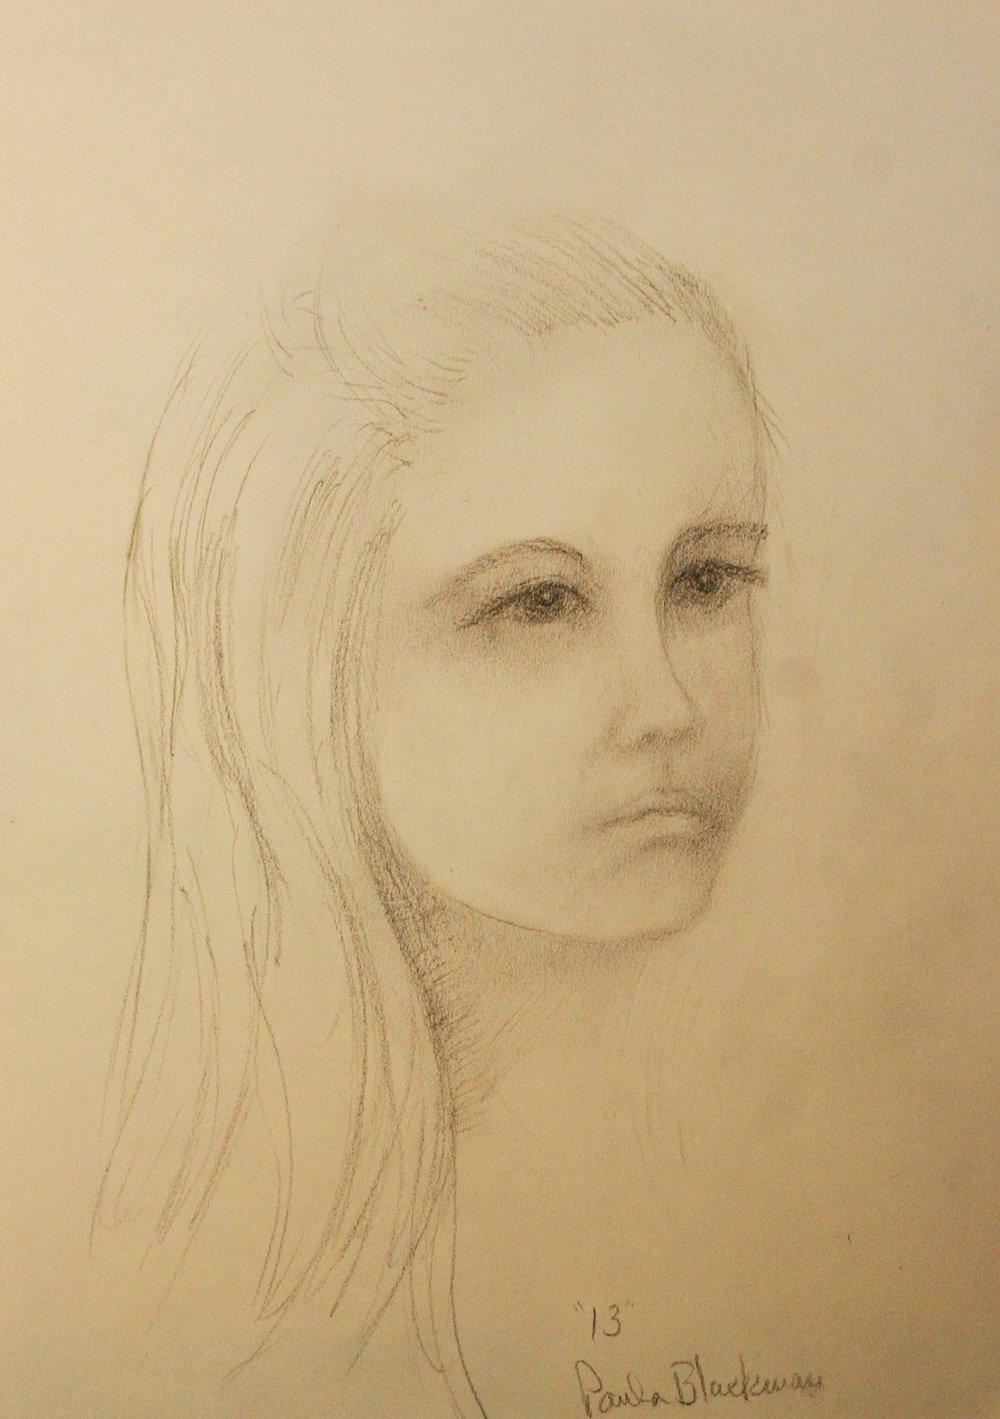 Paula Blackman did this drawing.